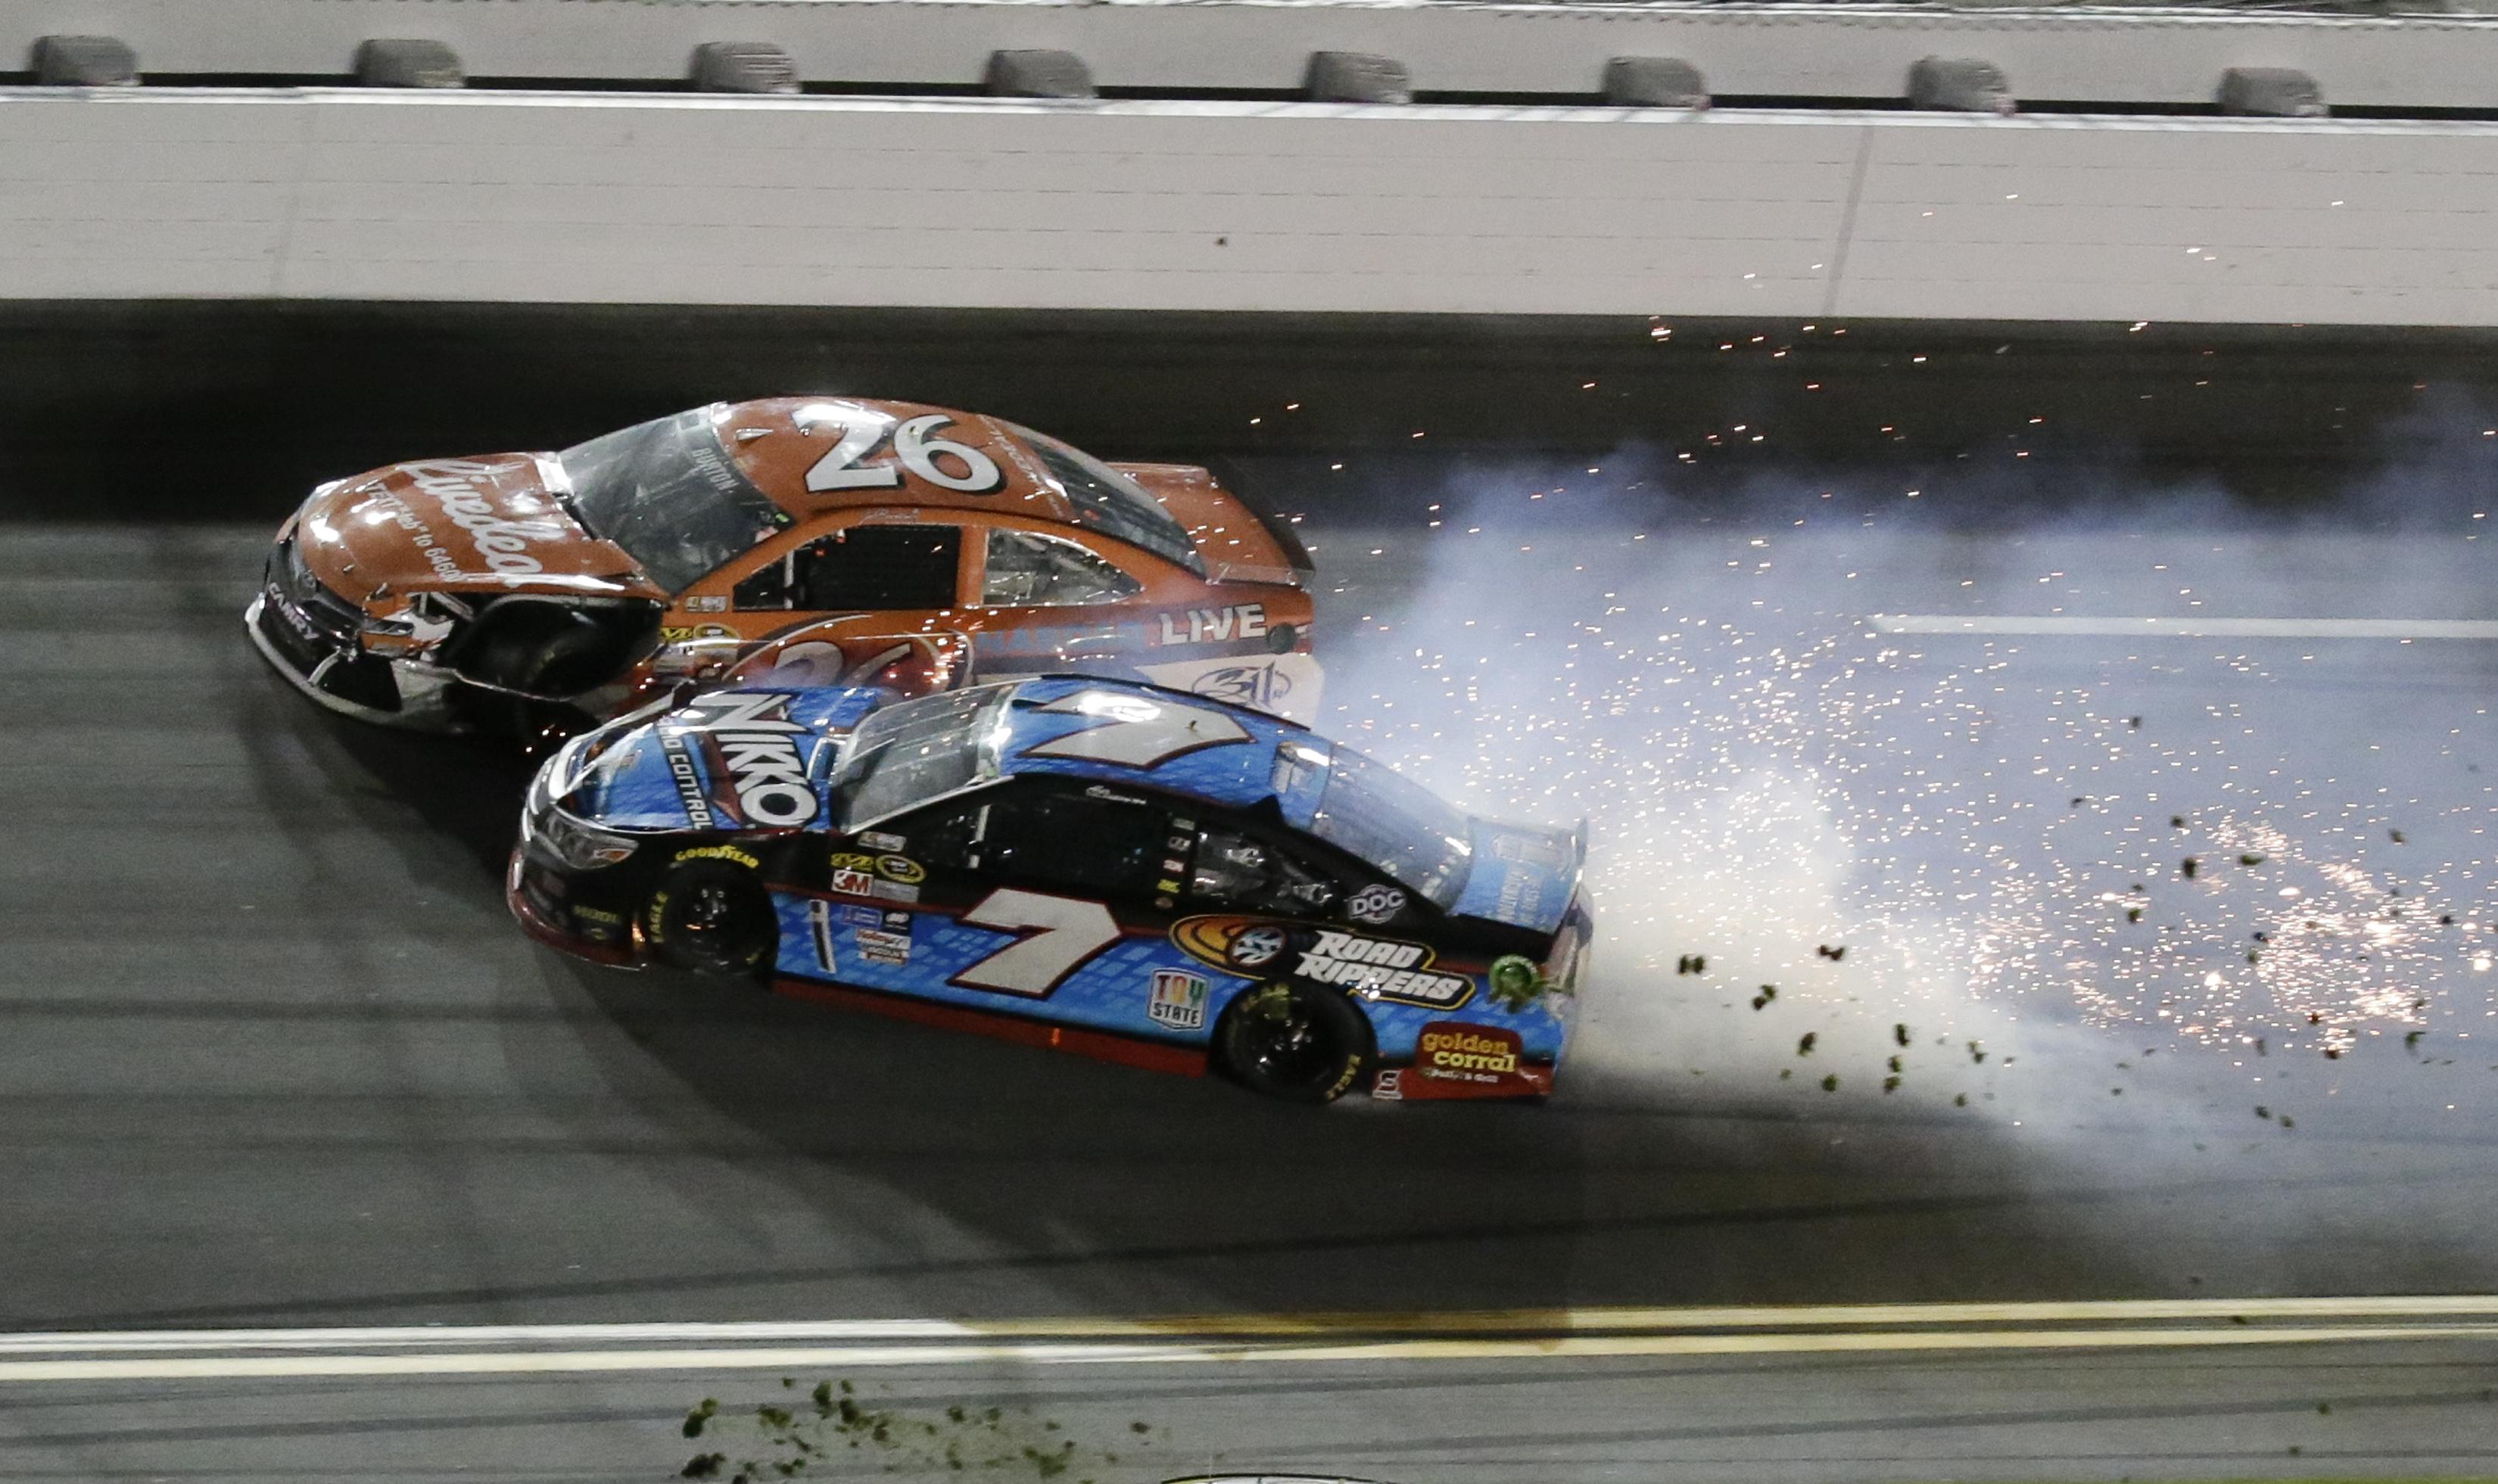 Earnhardt Jr. and Johnson win Daytona 500 qualifying races